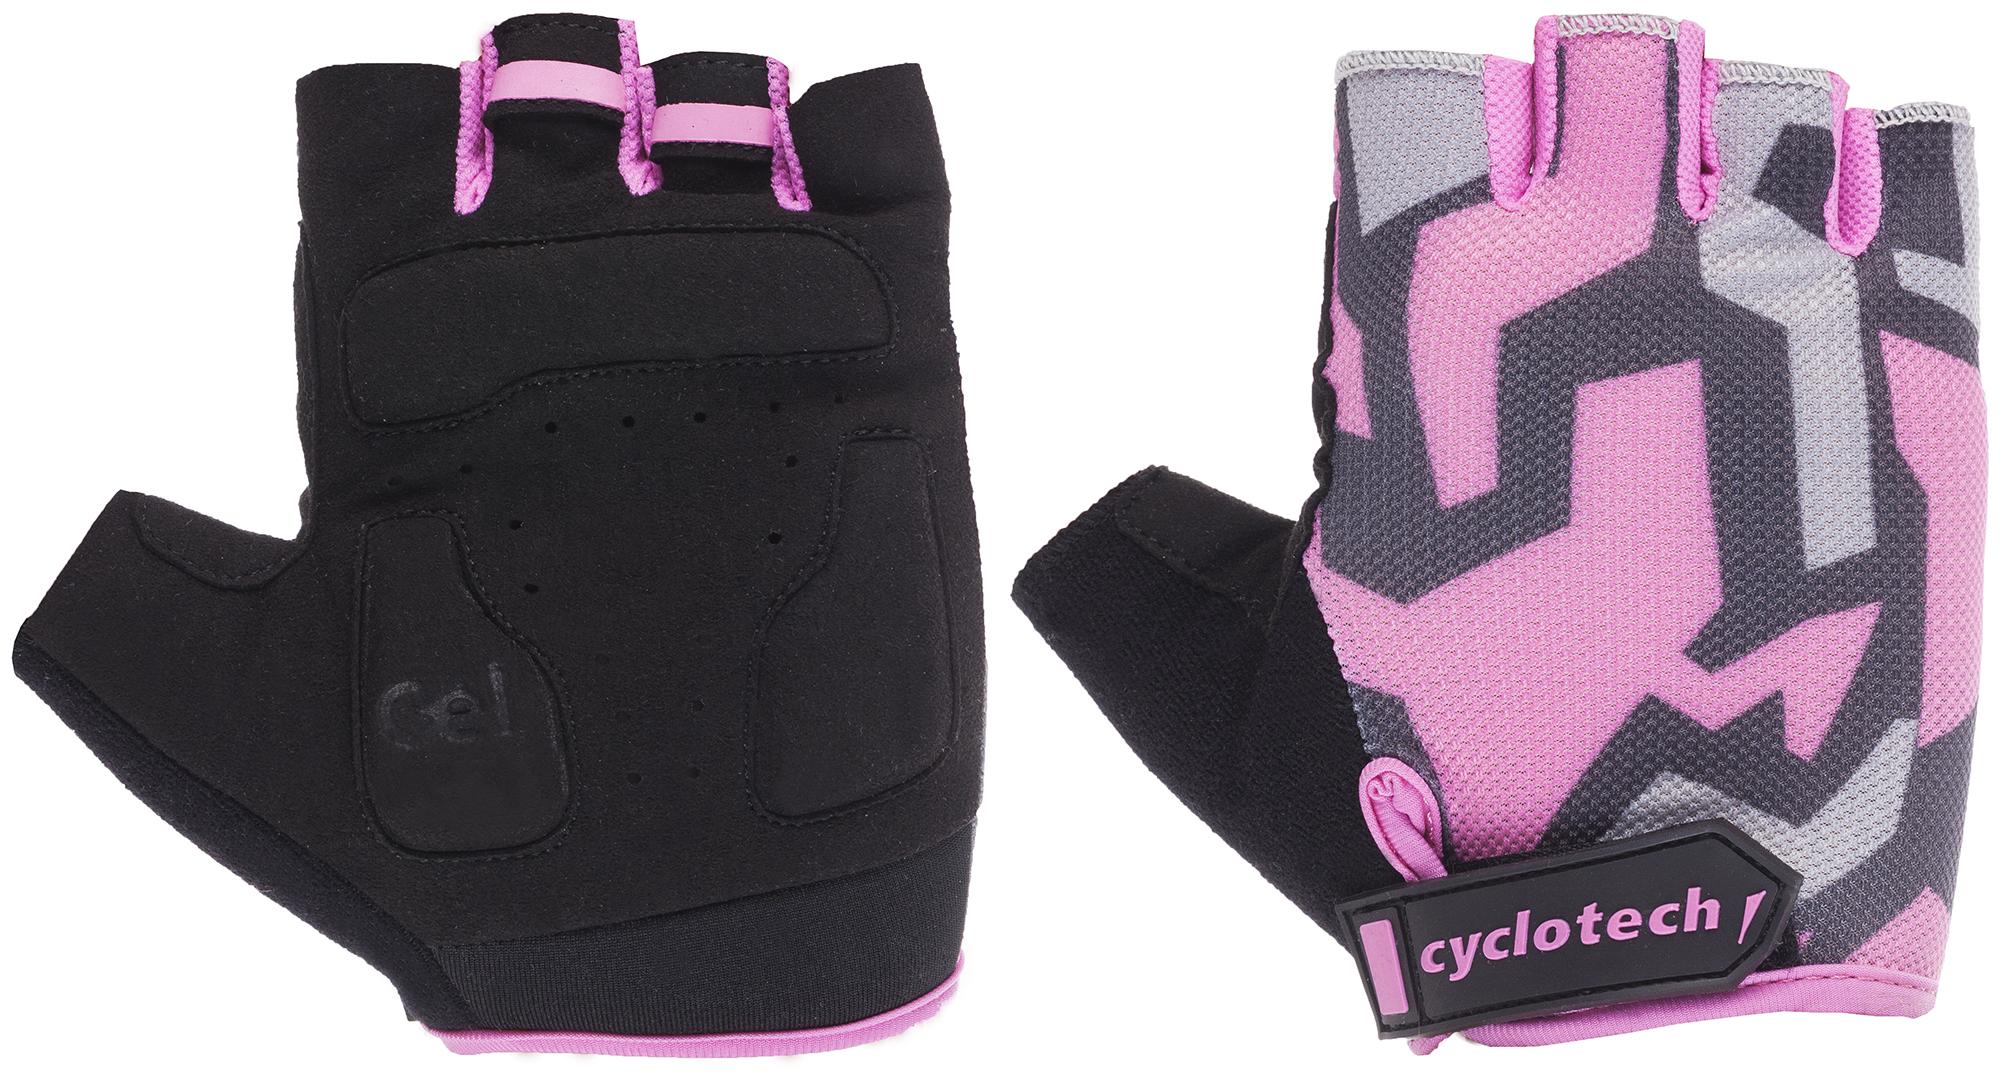 Cyclotech Перчатки велосипедные Cyclotech Razor cyclotech перчатки велосипедные cyclotech canna